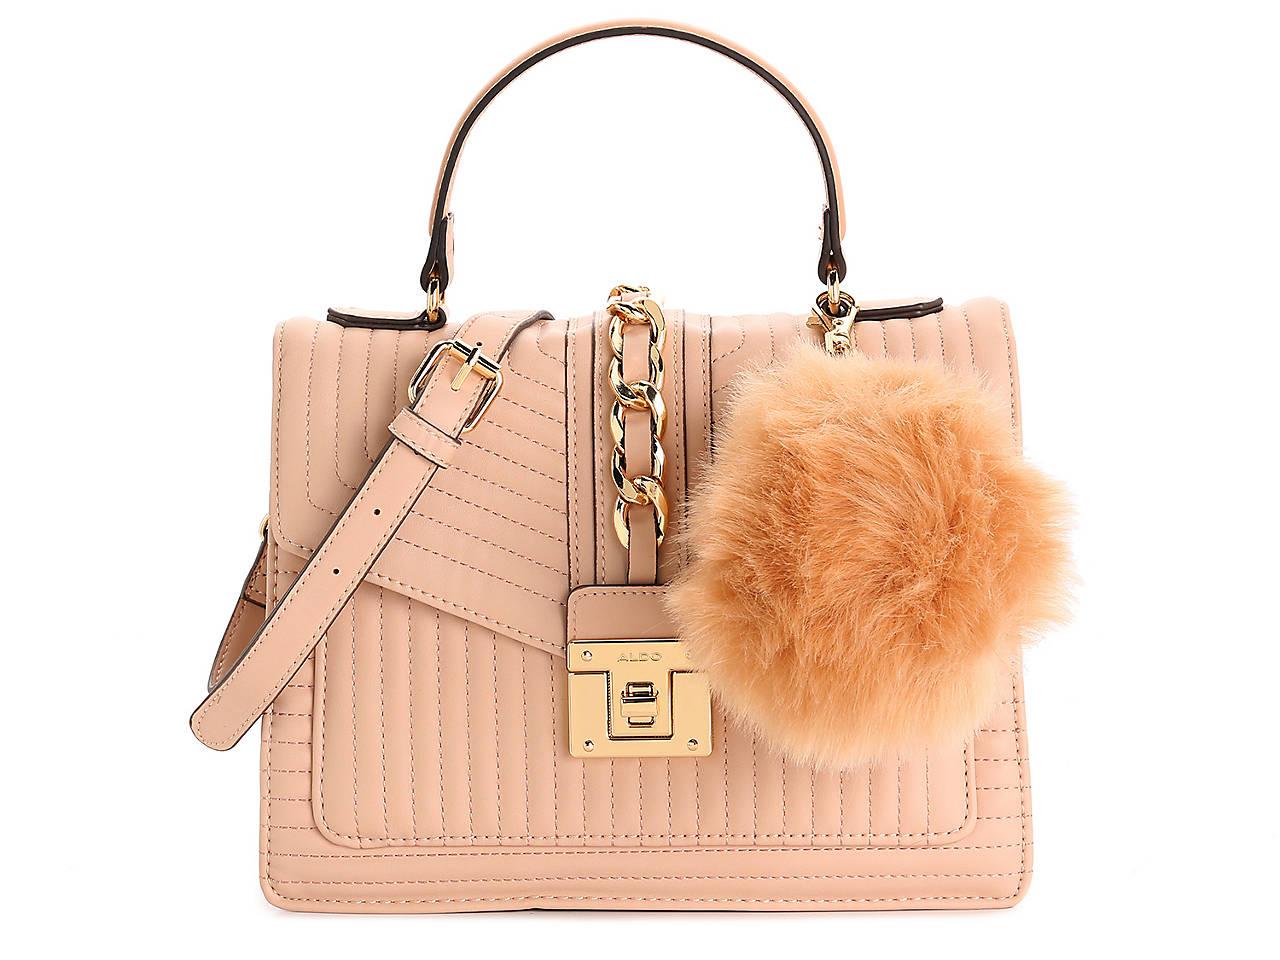 5b316eb2cee Aldo Jerilini Satchel Women's Handbags & Accessories | DSW